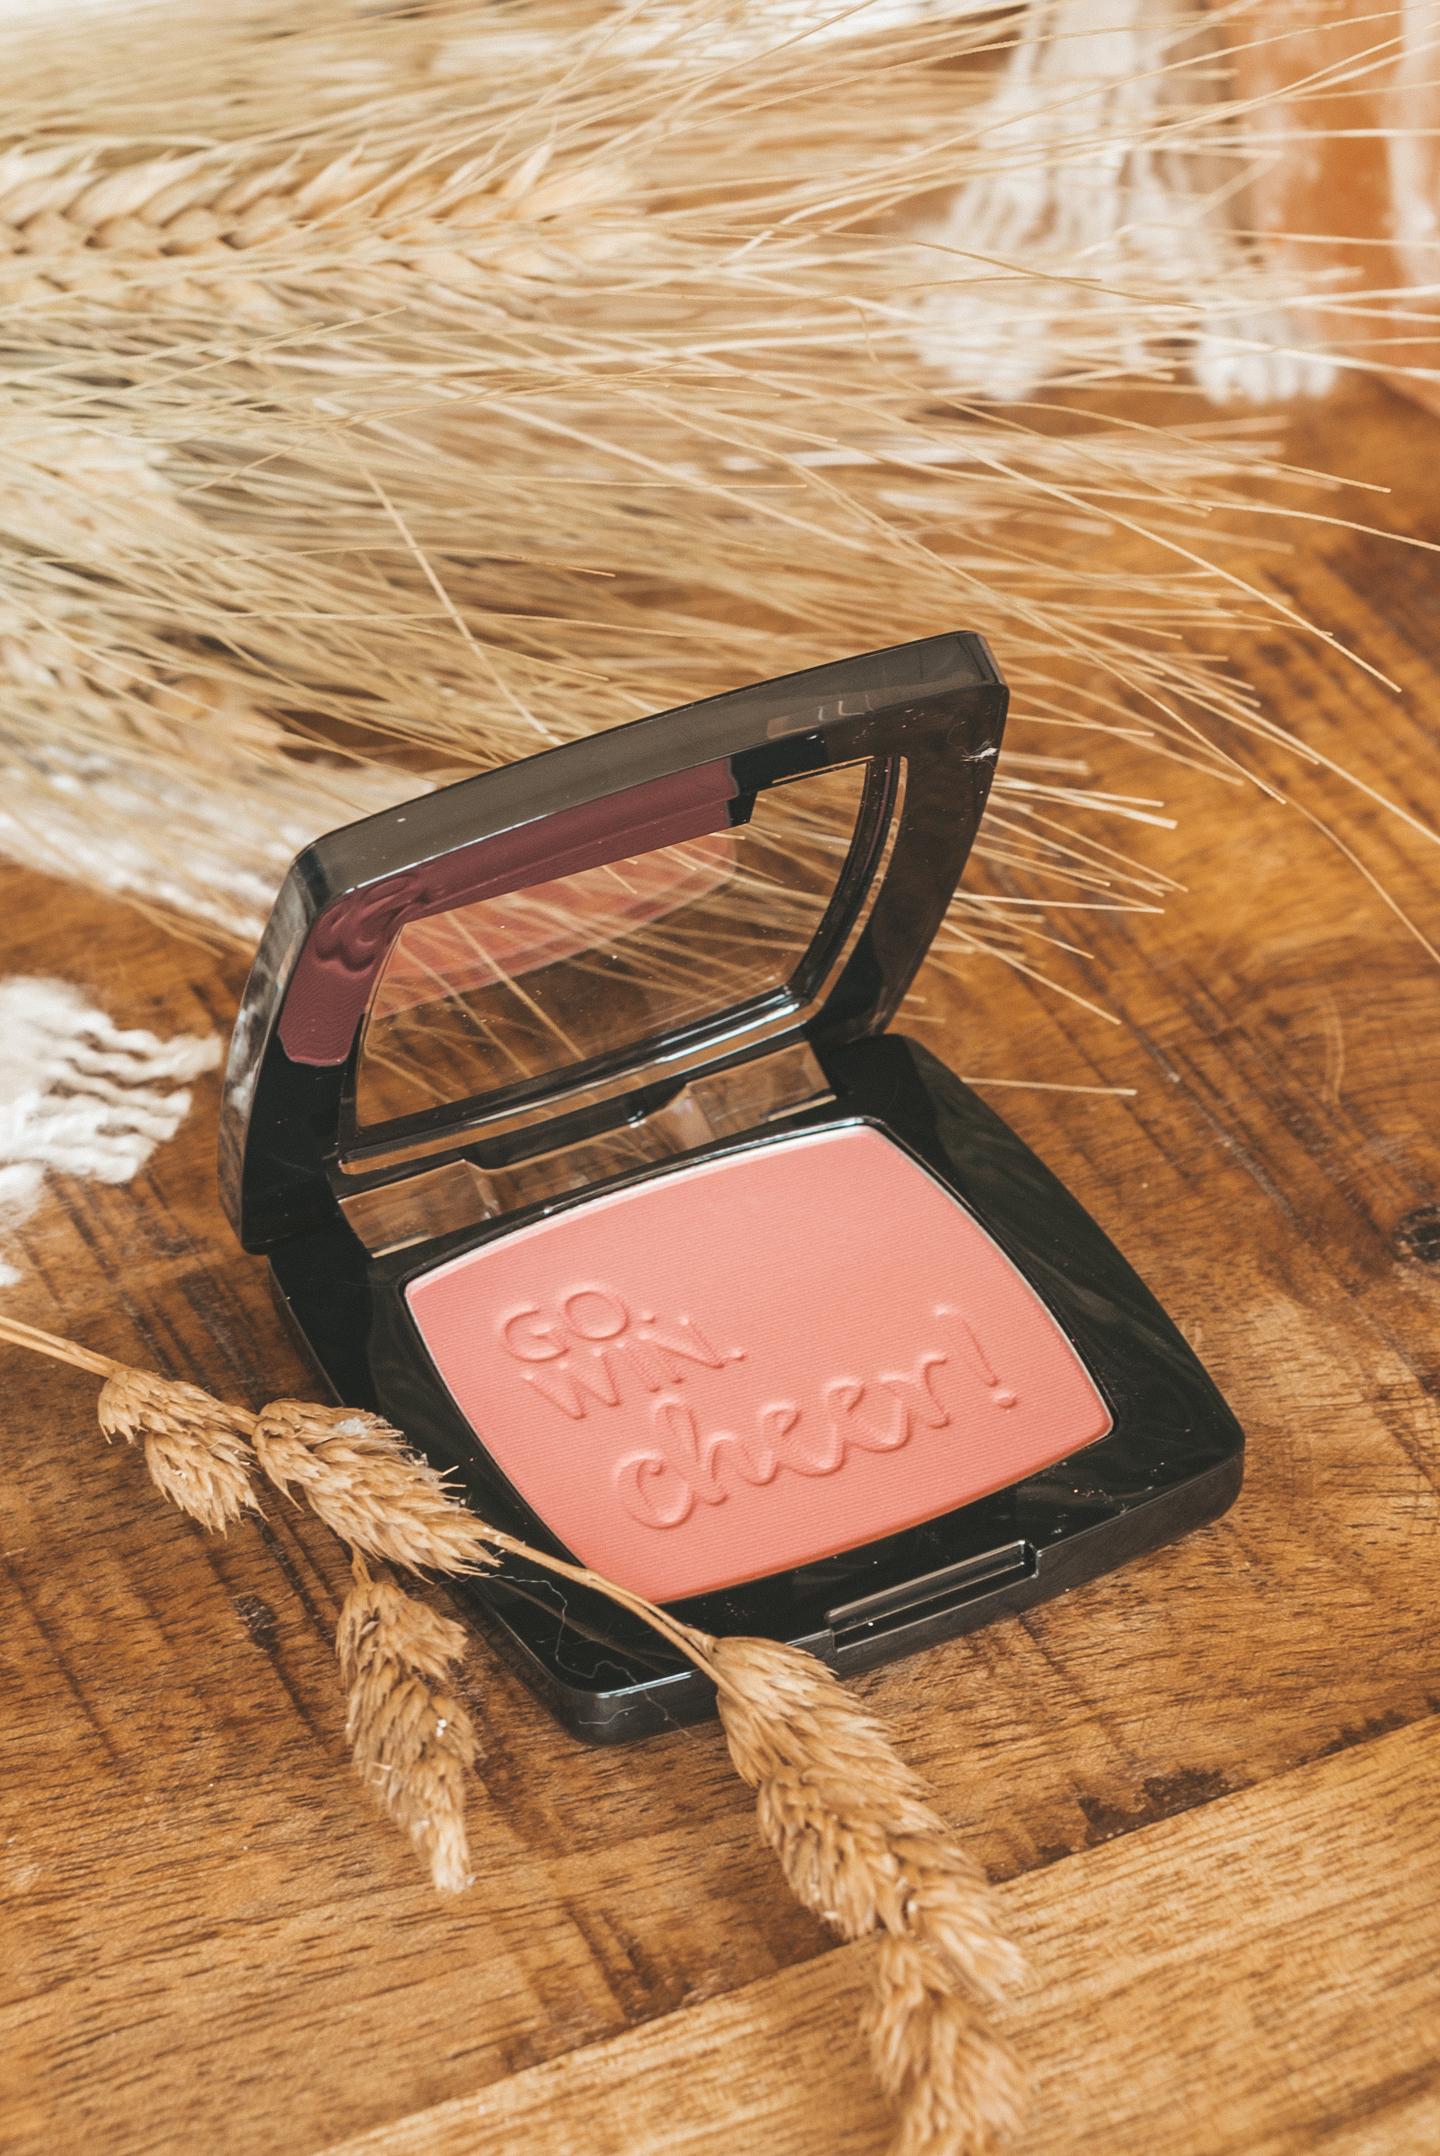 Blush box Catrice 020 Glistening Pink